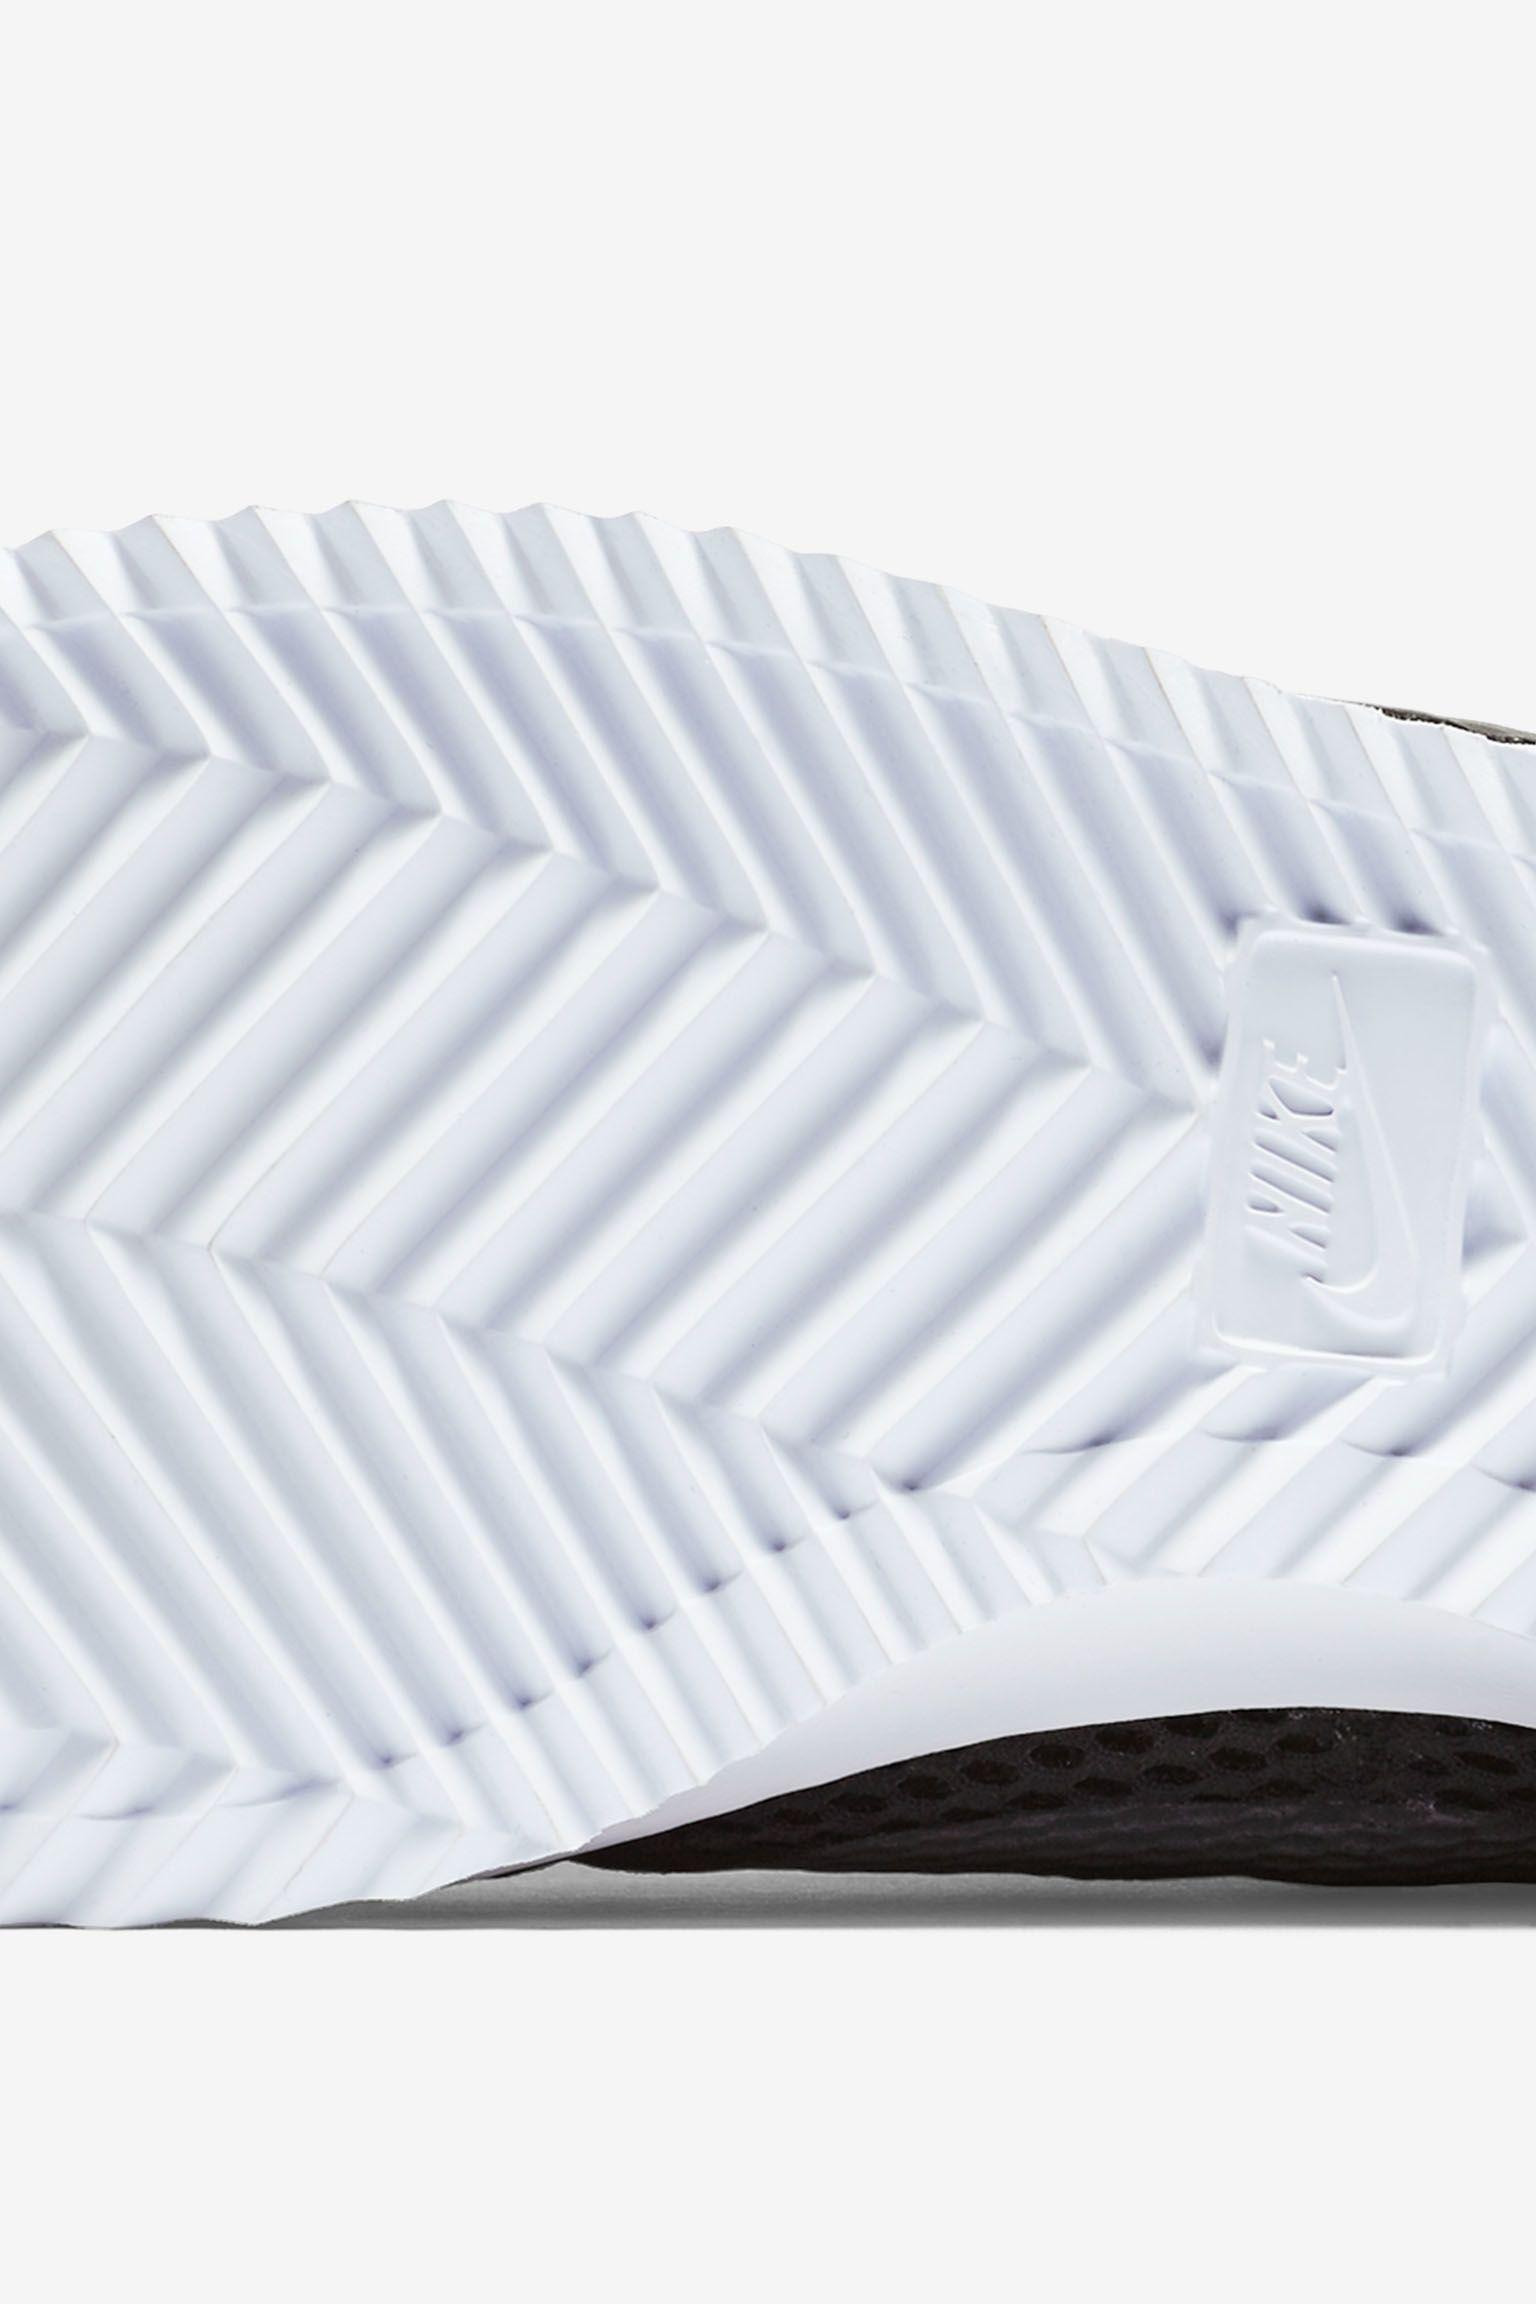 Nike Cortez Ultra Breathe 'Black'